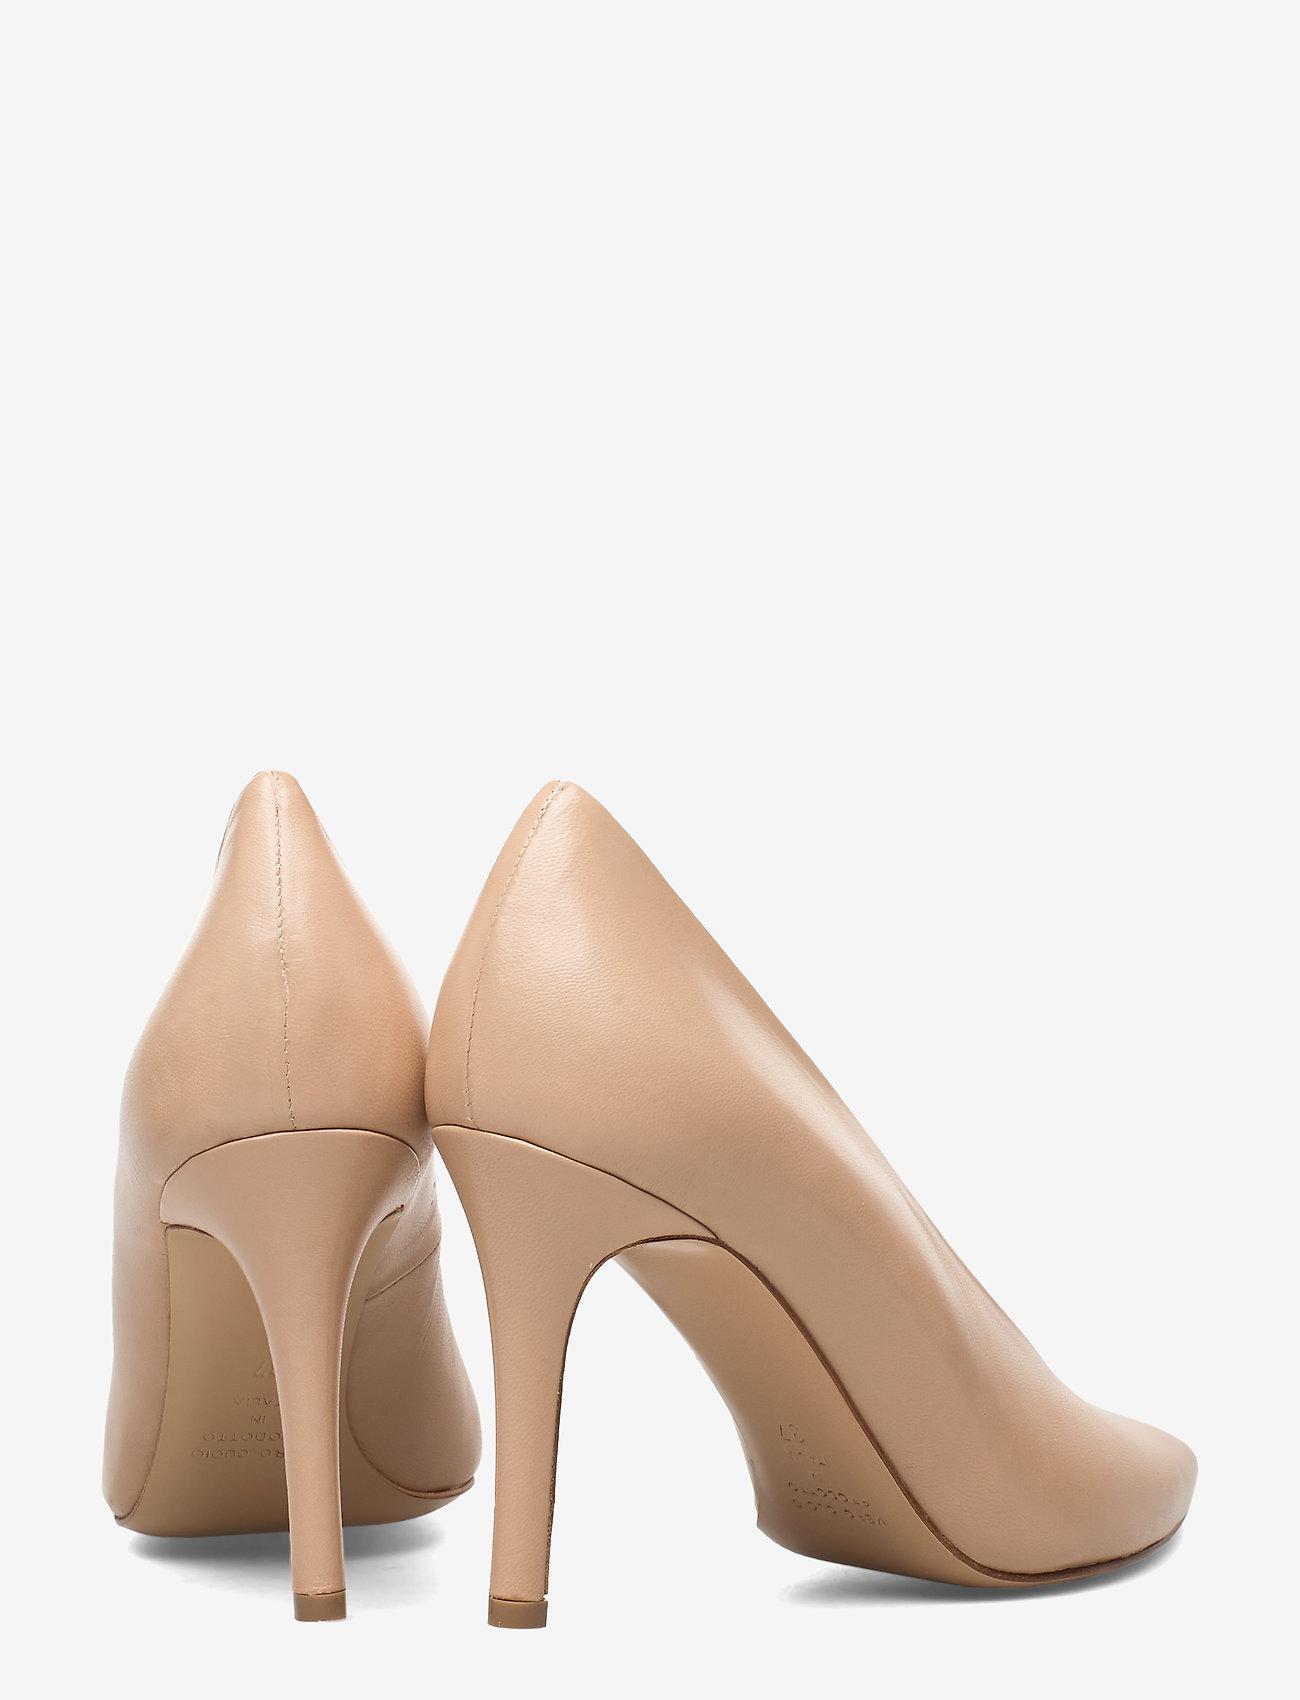 Pinch Me (Beige Leather) (810 kr) - Jennie-Ellen